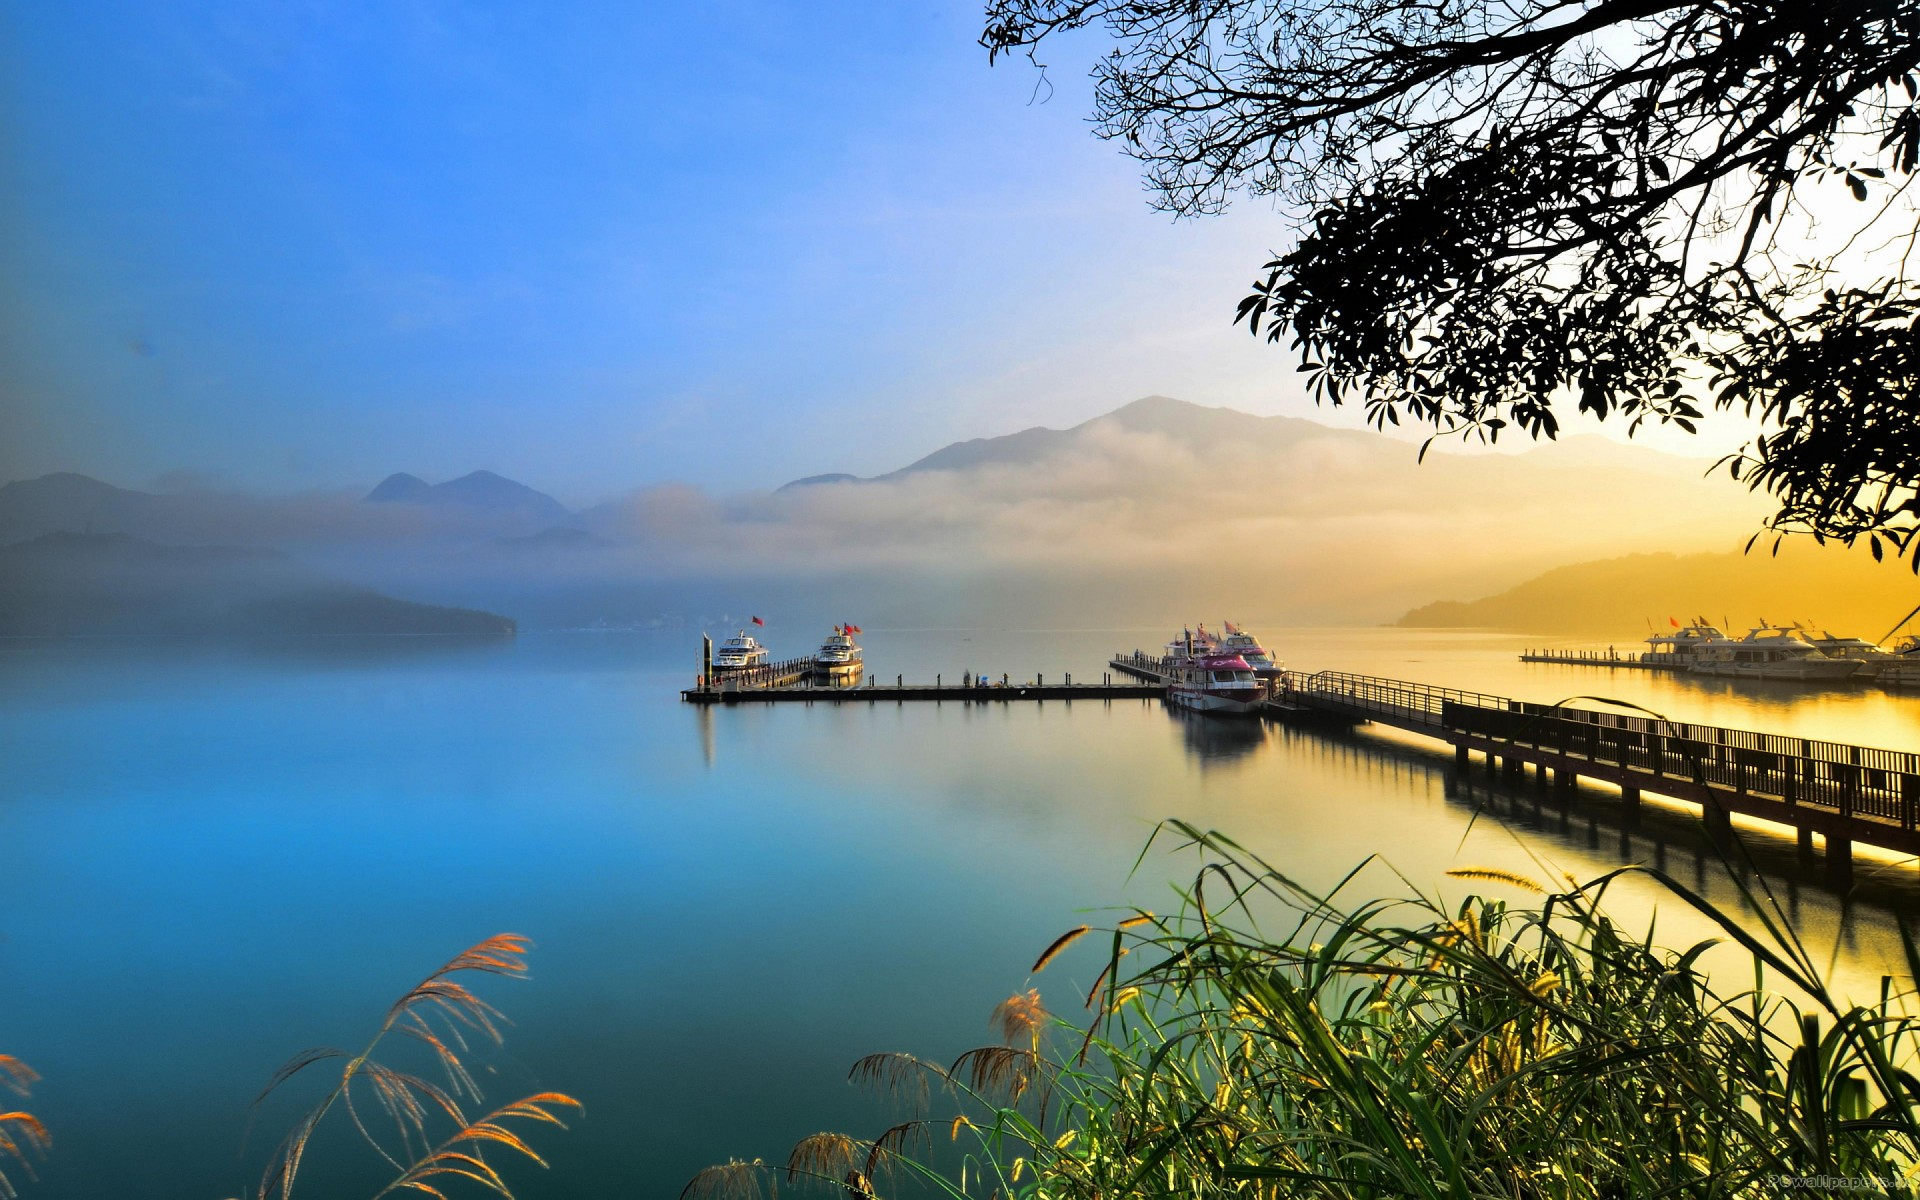 lake wallpapers hd